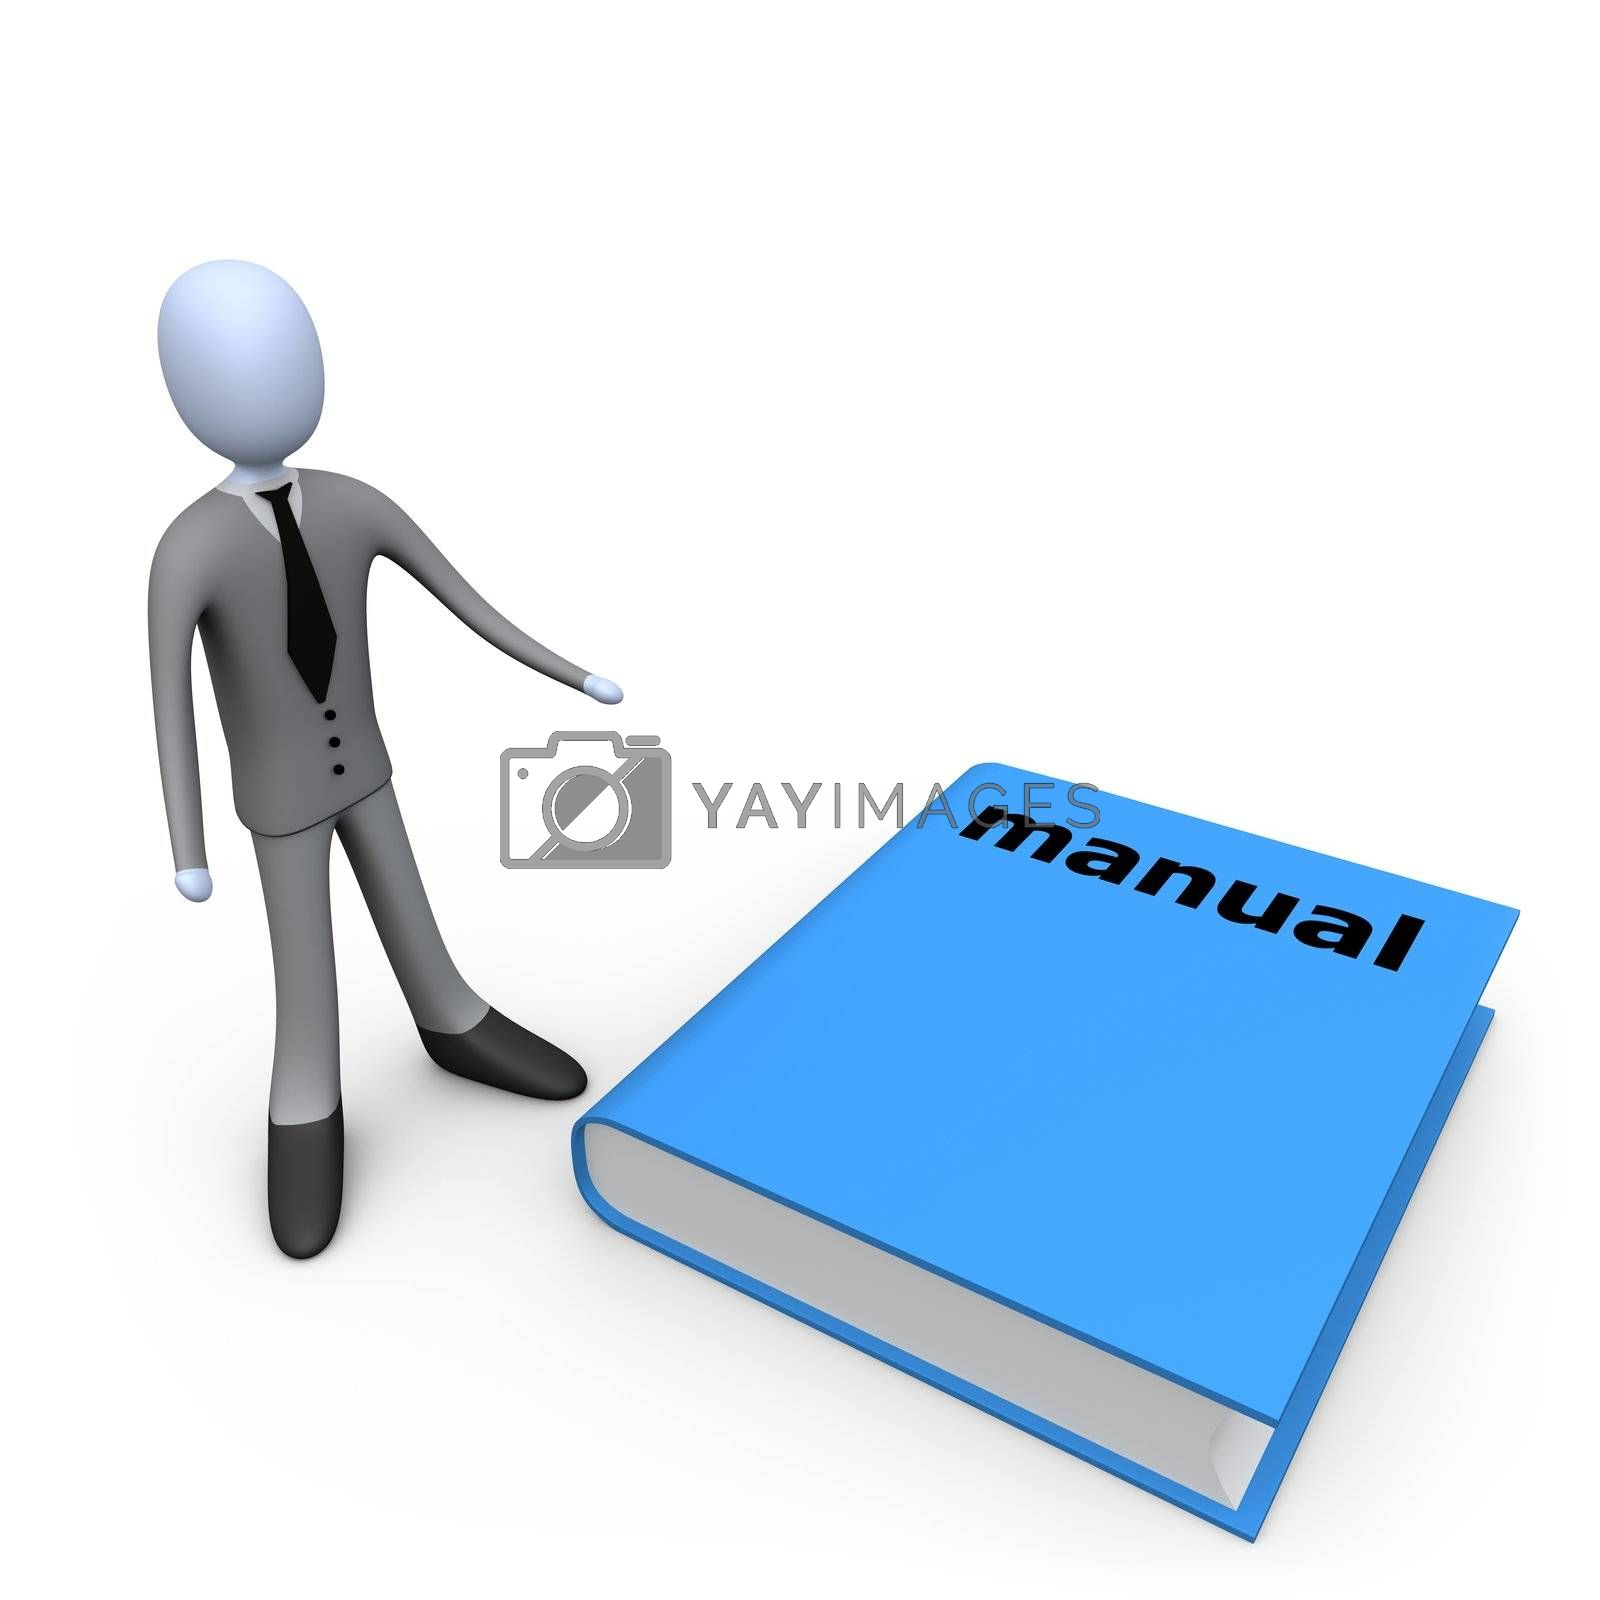 Big Manual by 3pod